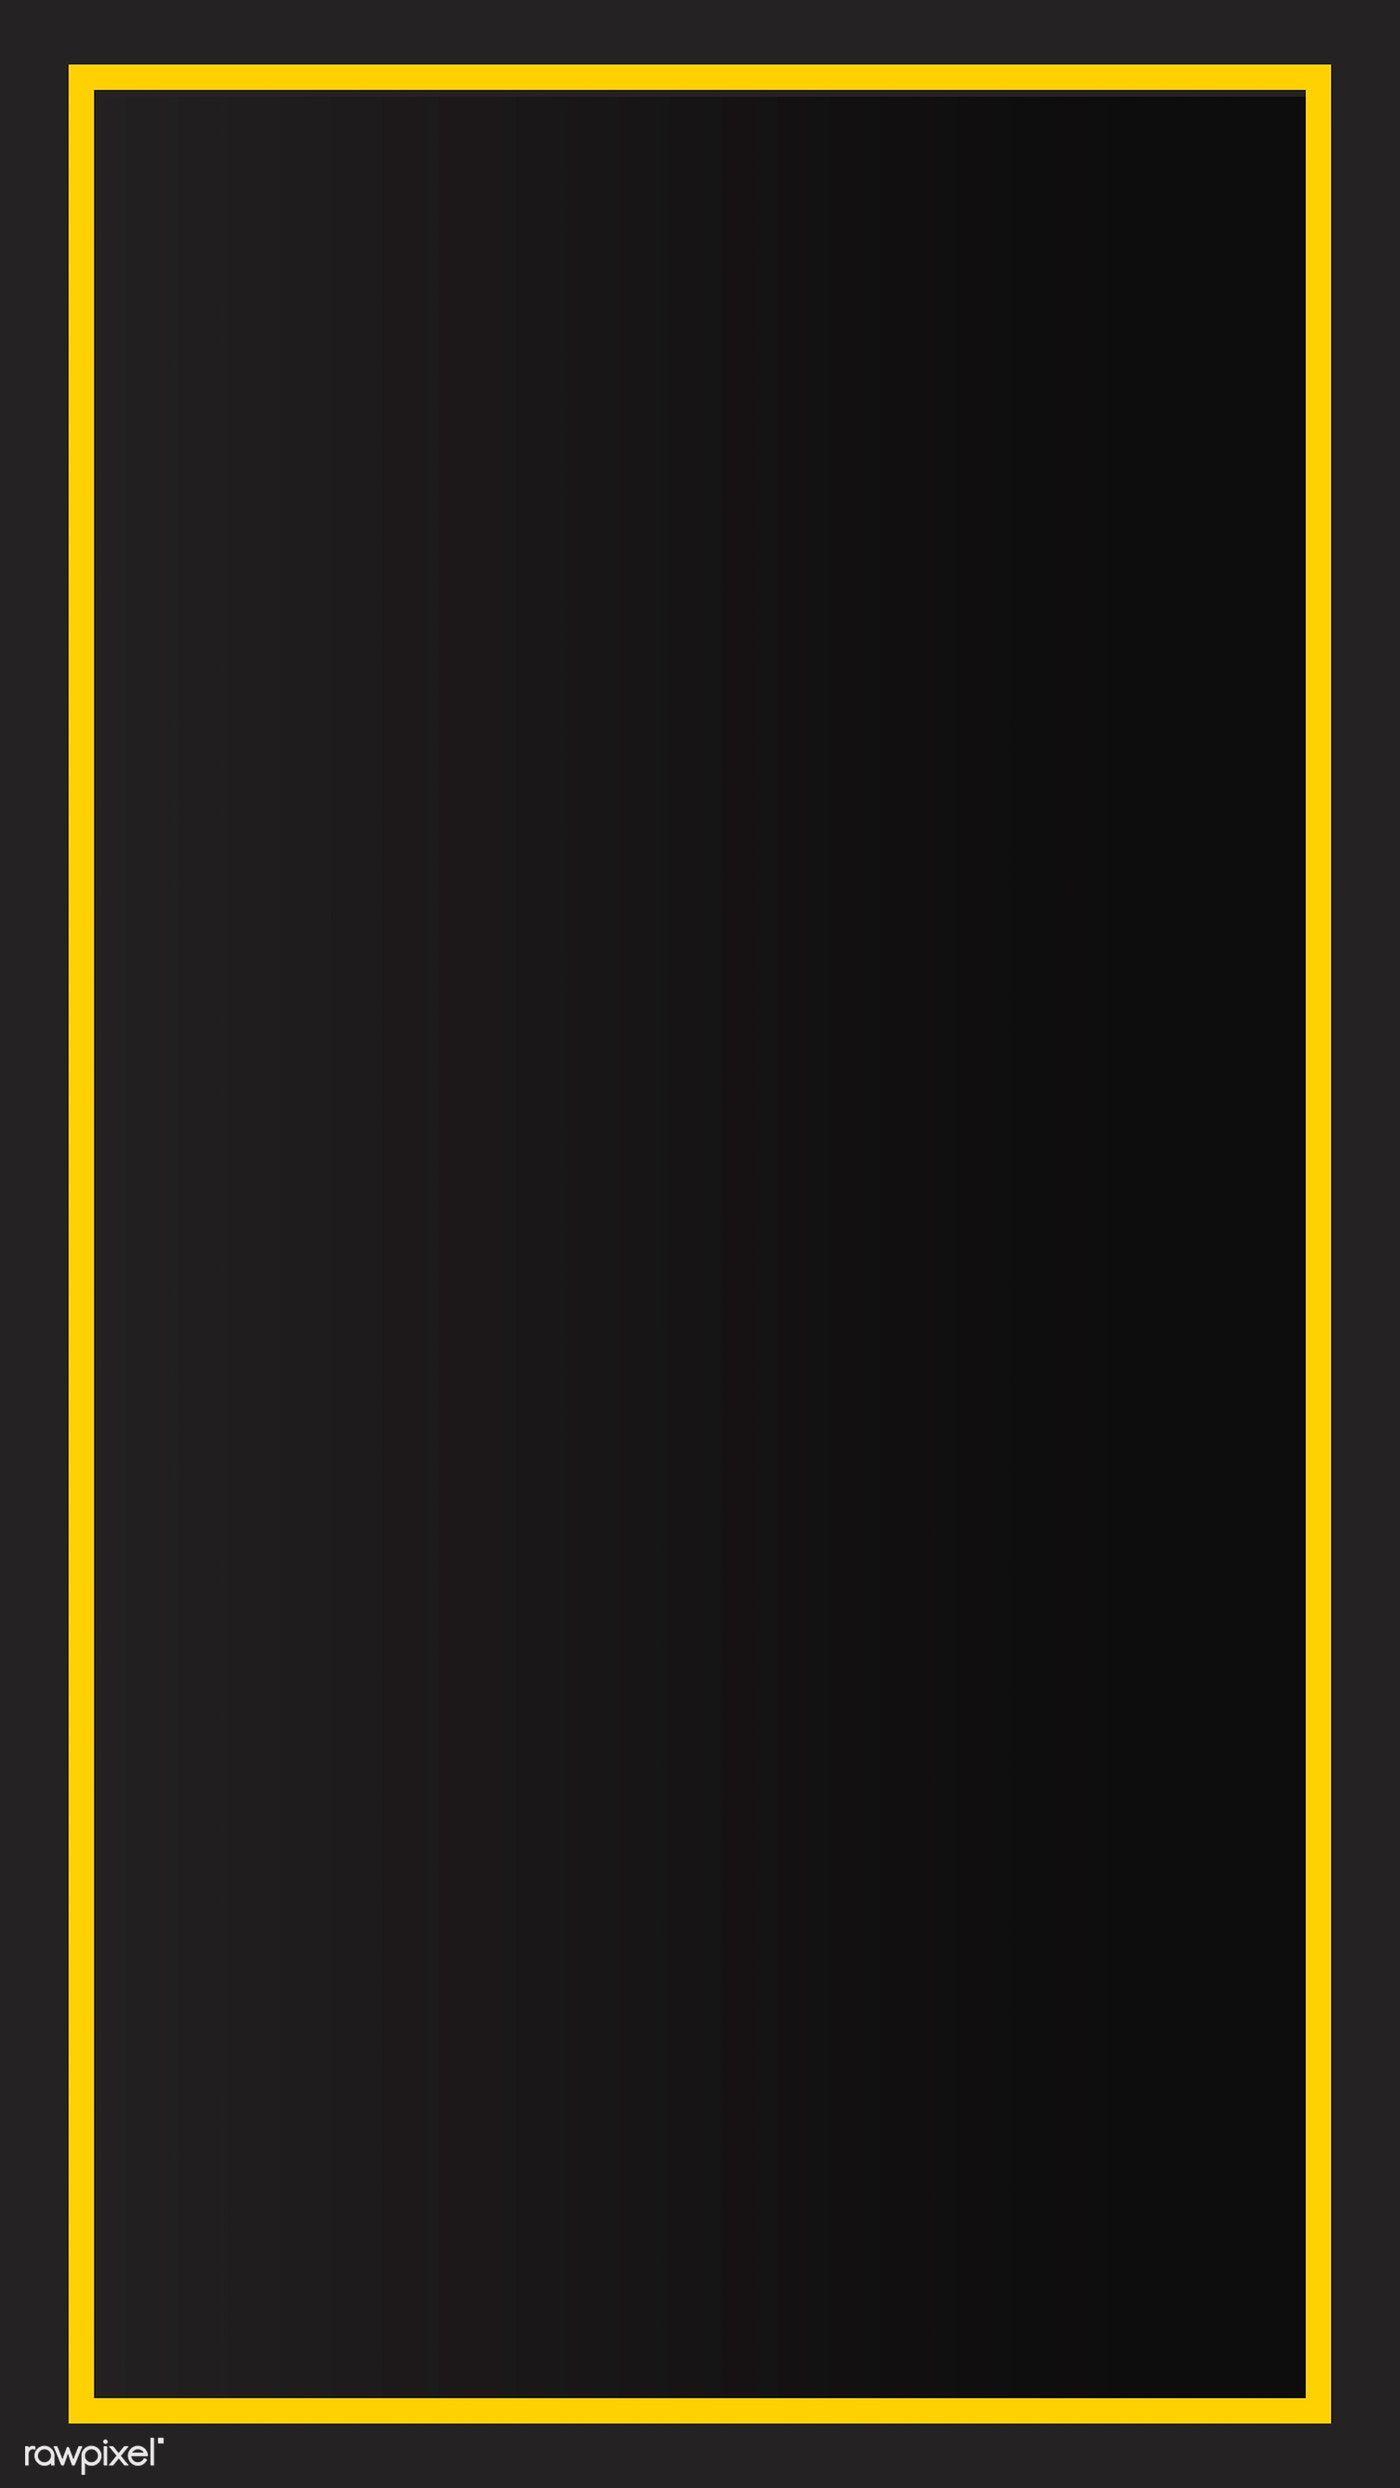 Download Premium Image Of Yellow Border Black Mobile Phone